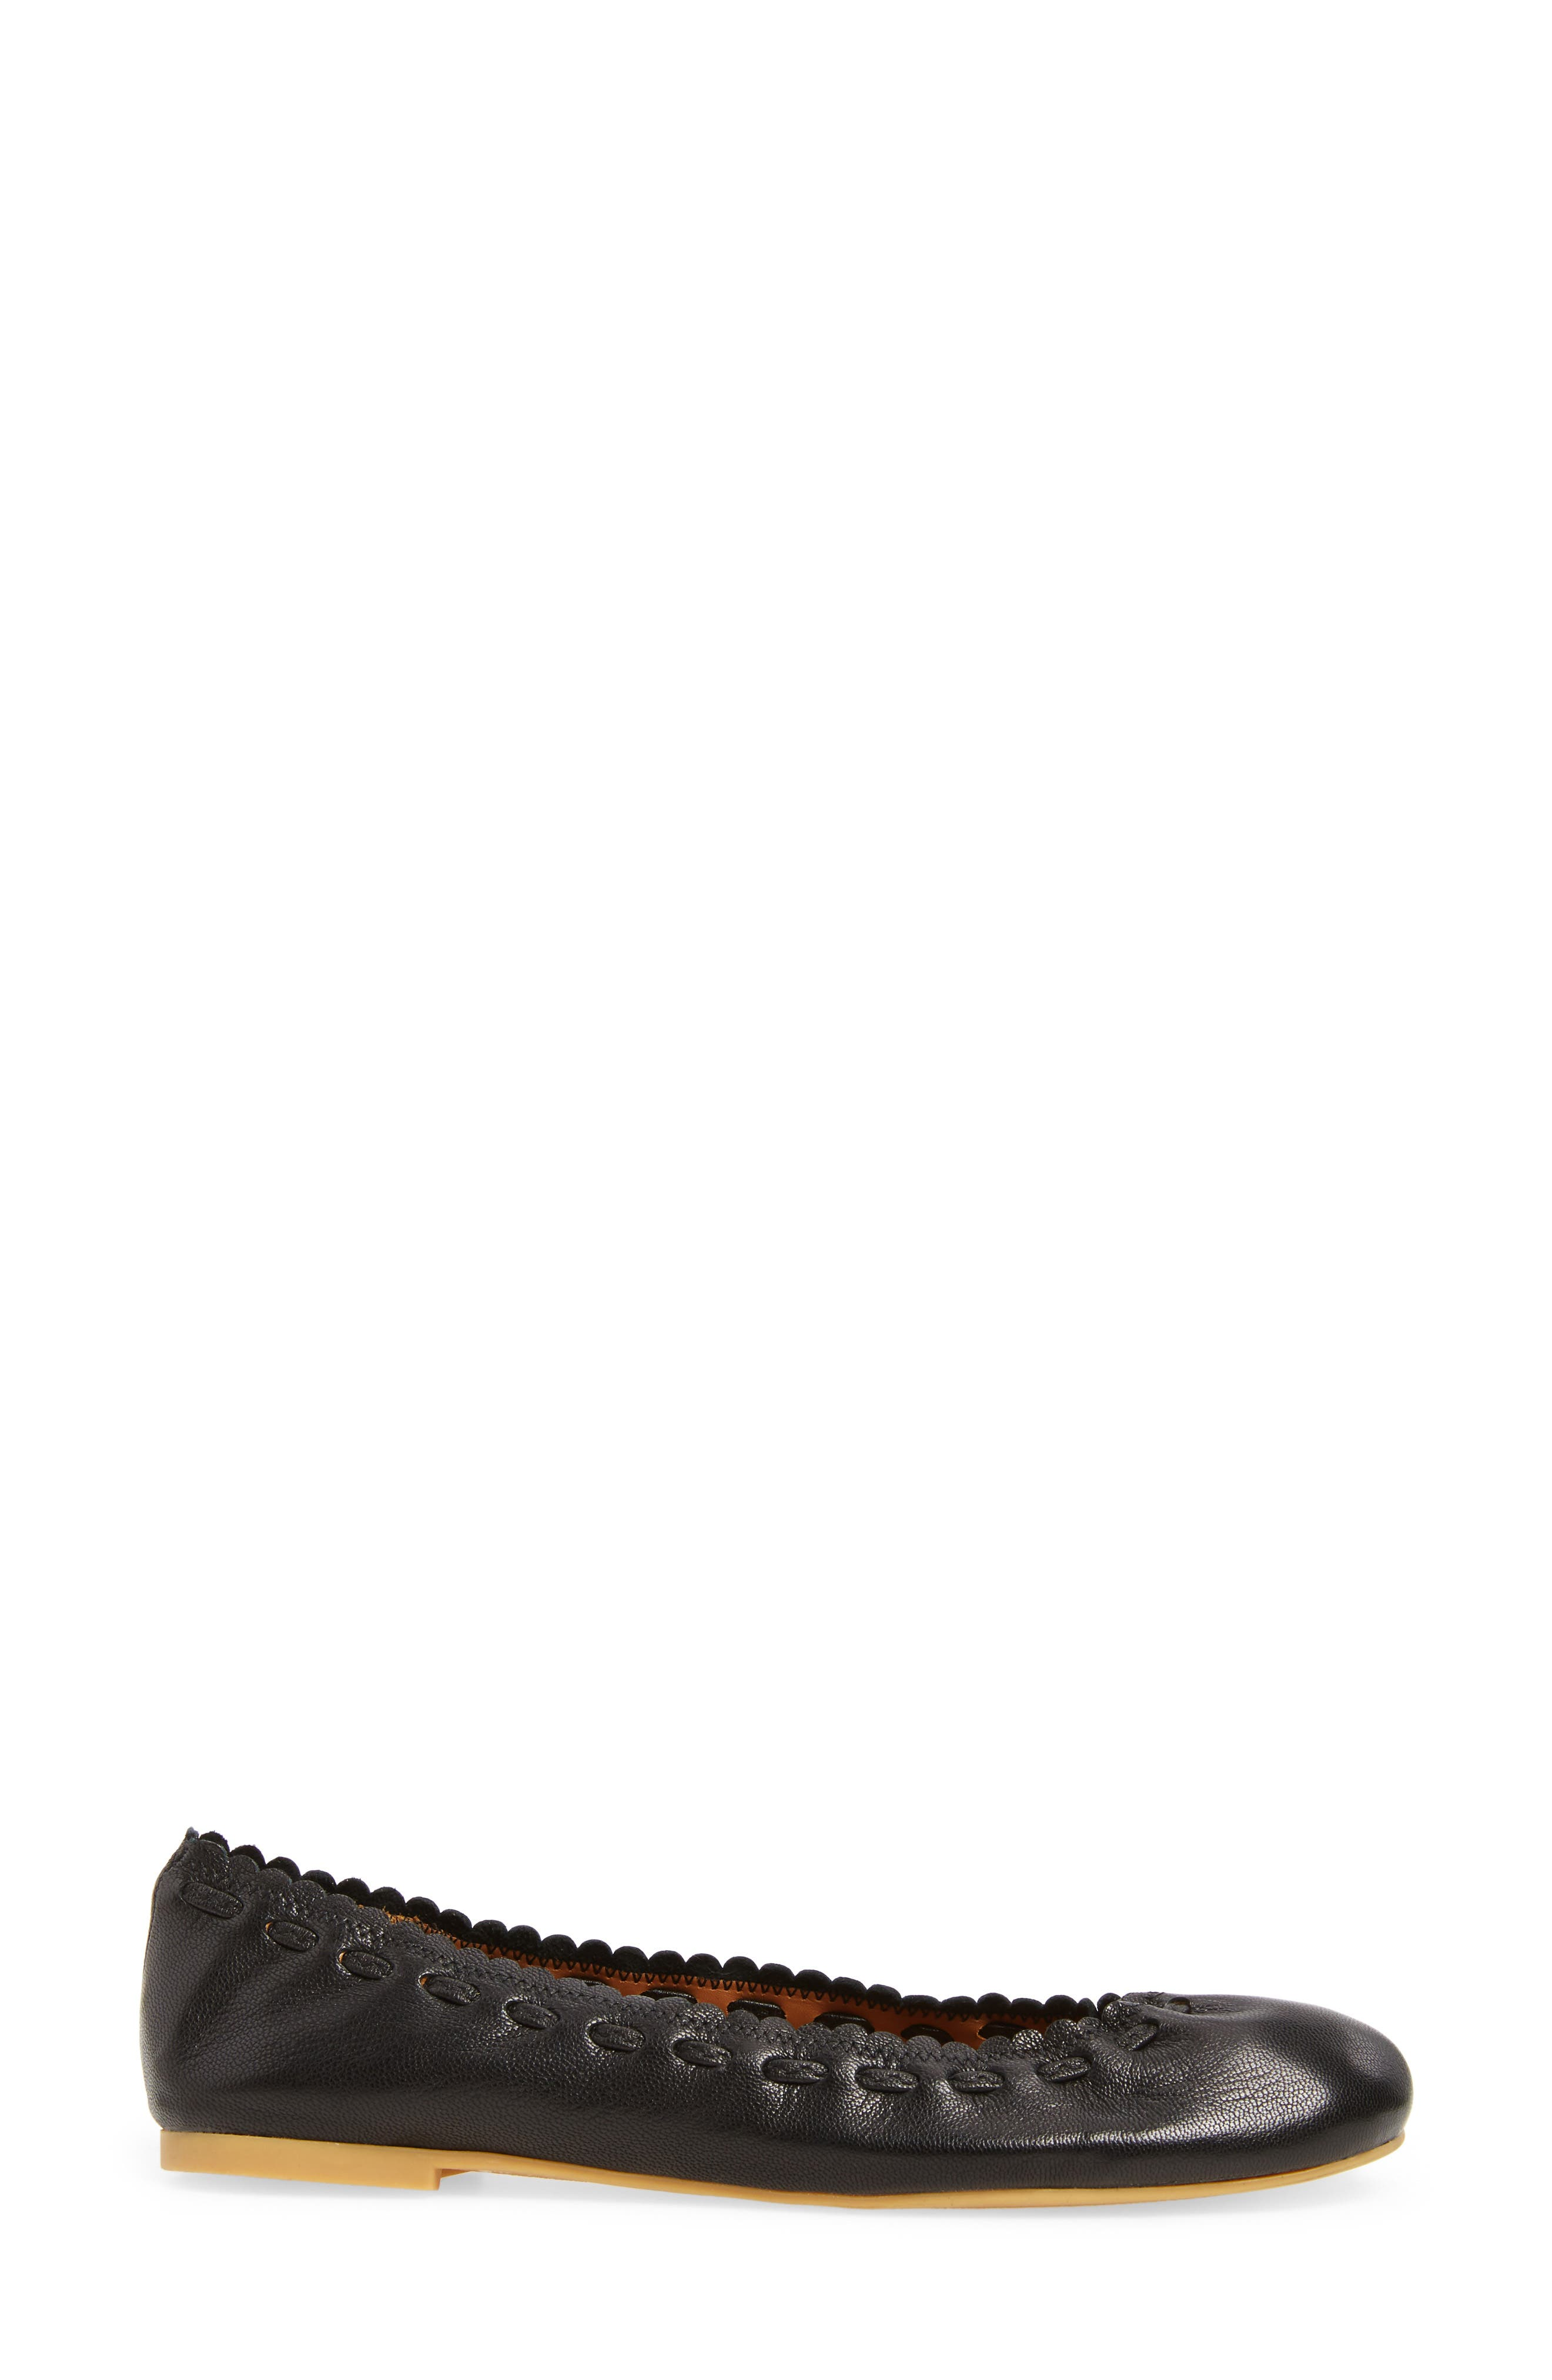 'Jane' Ballerina Flat,                             Alternate thumbnail 3, color,                             Black/ Goat Leather